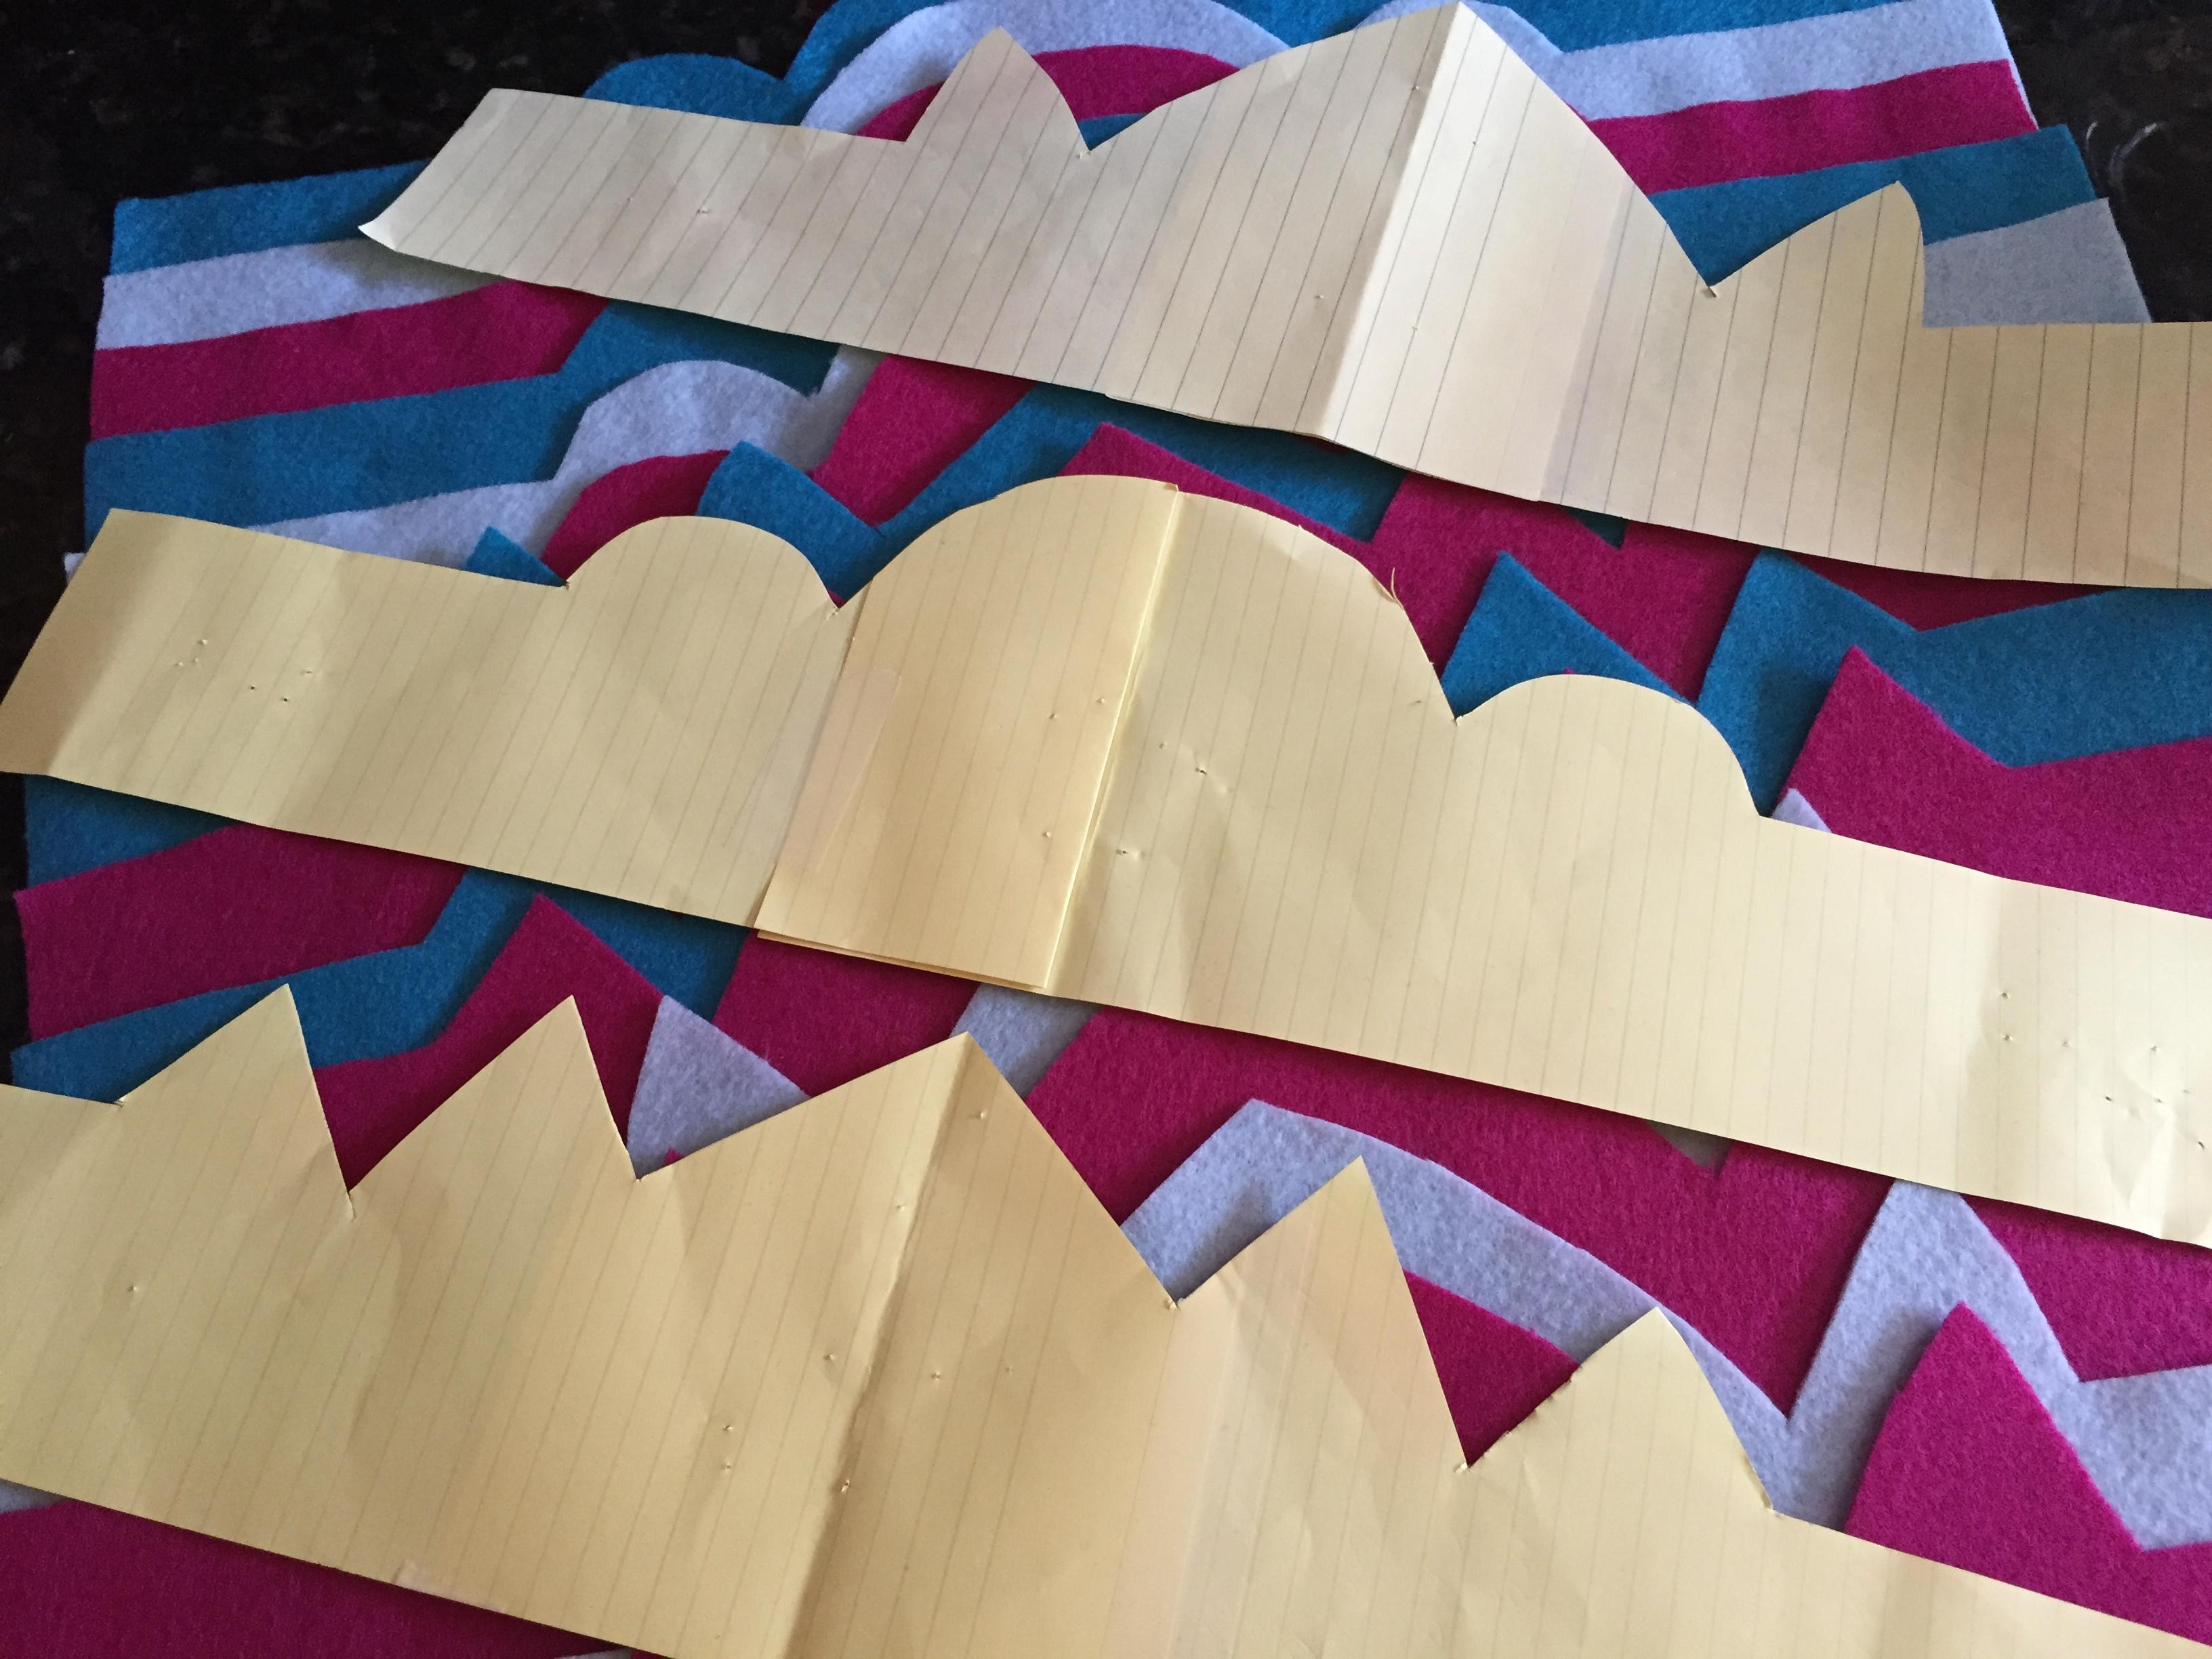 1. cut pattern for felt crowns